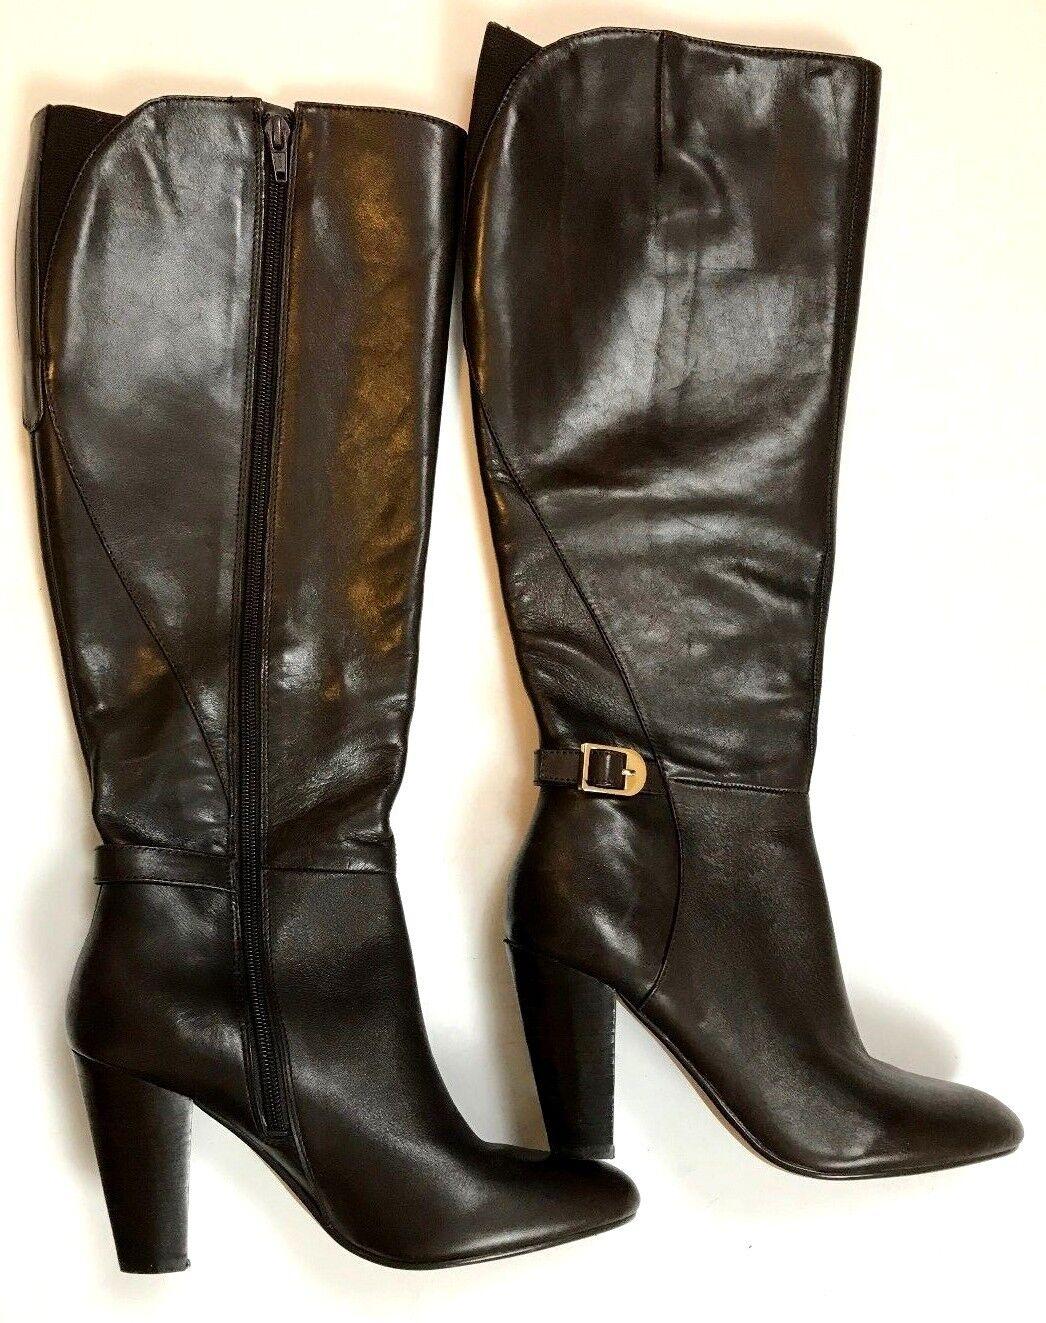 Marc Fisher Dark Burgundy Leather Knee High Women's Boot Size 7.5 M